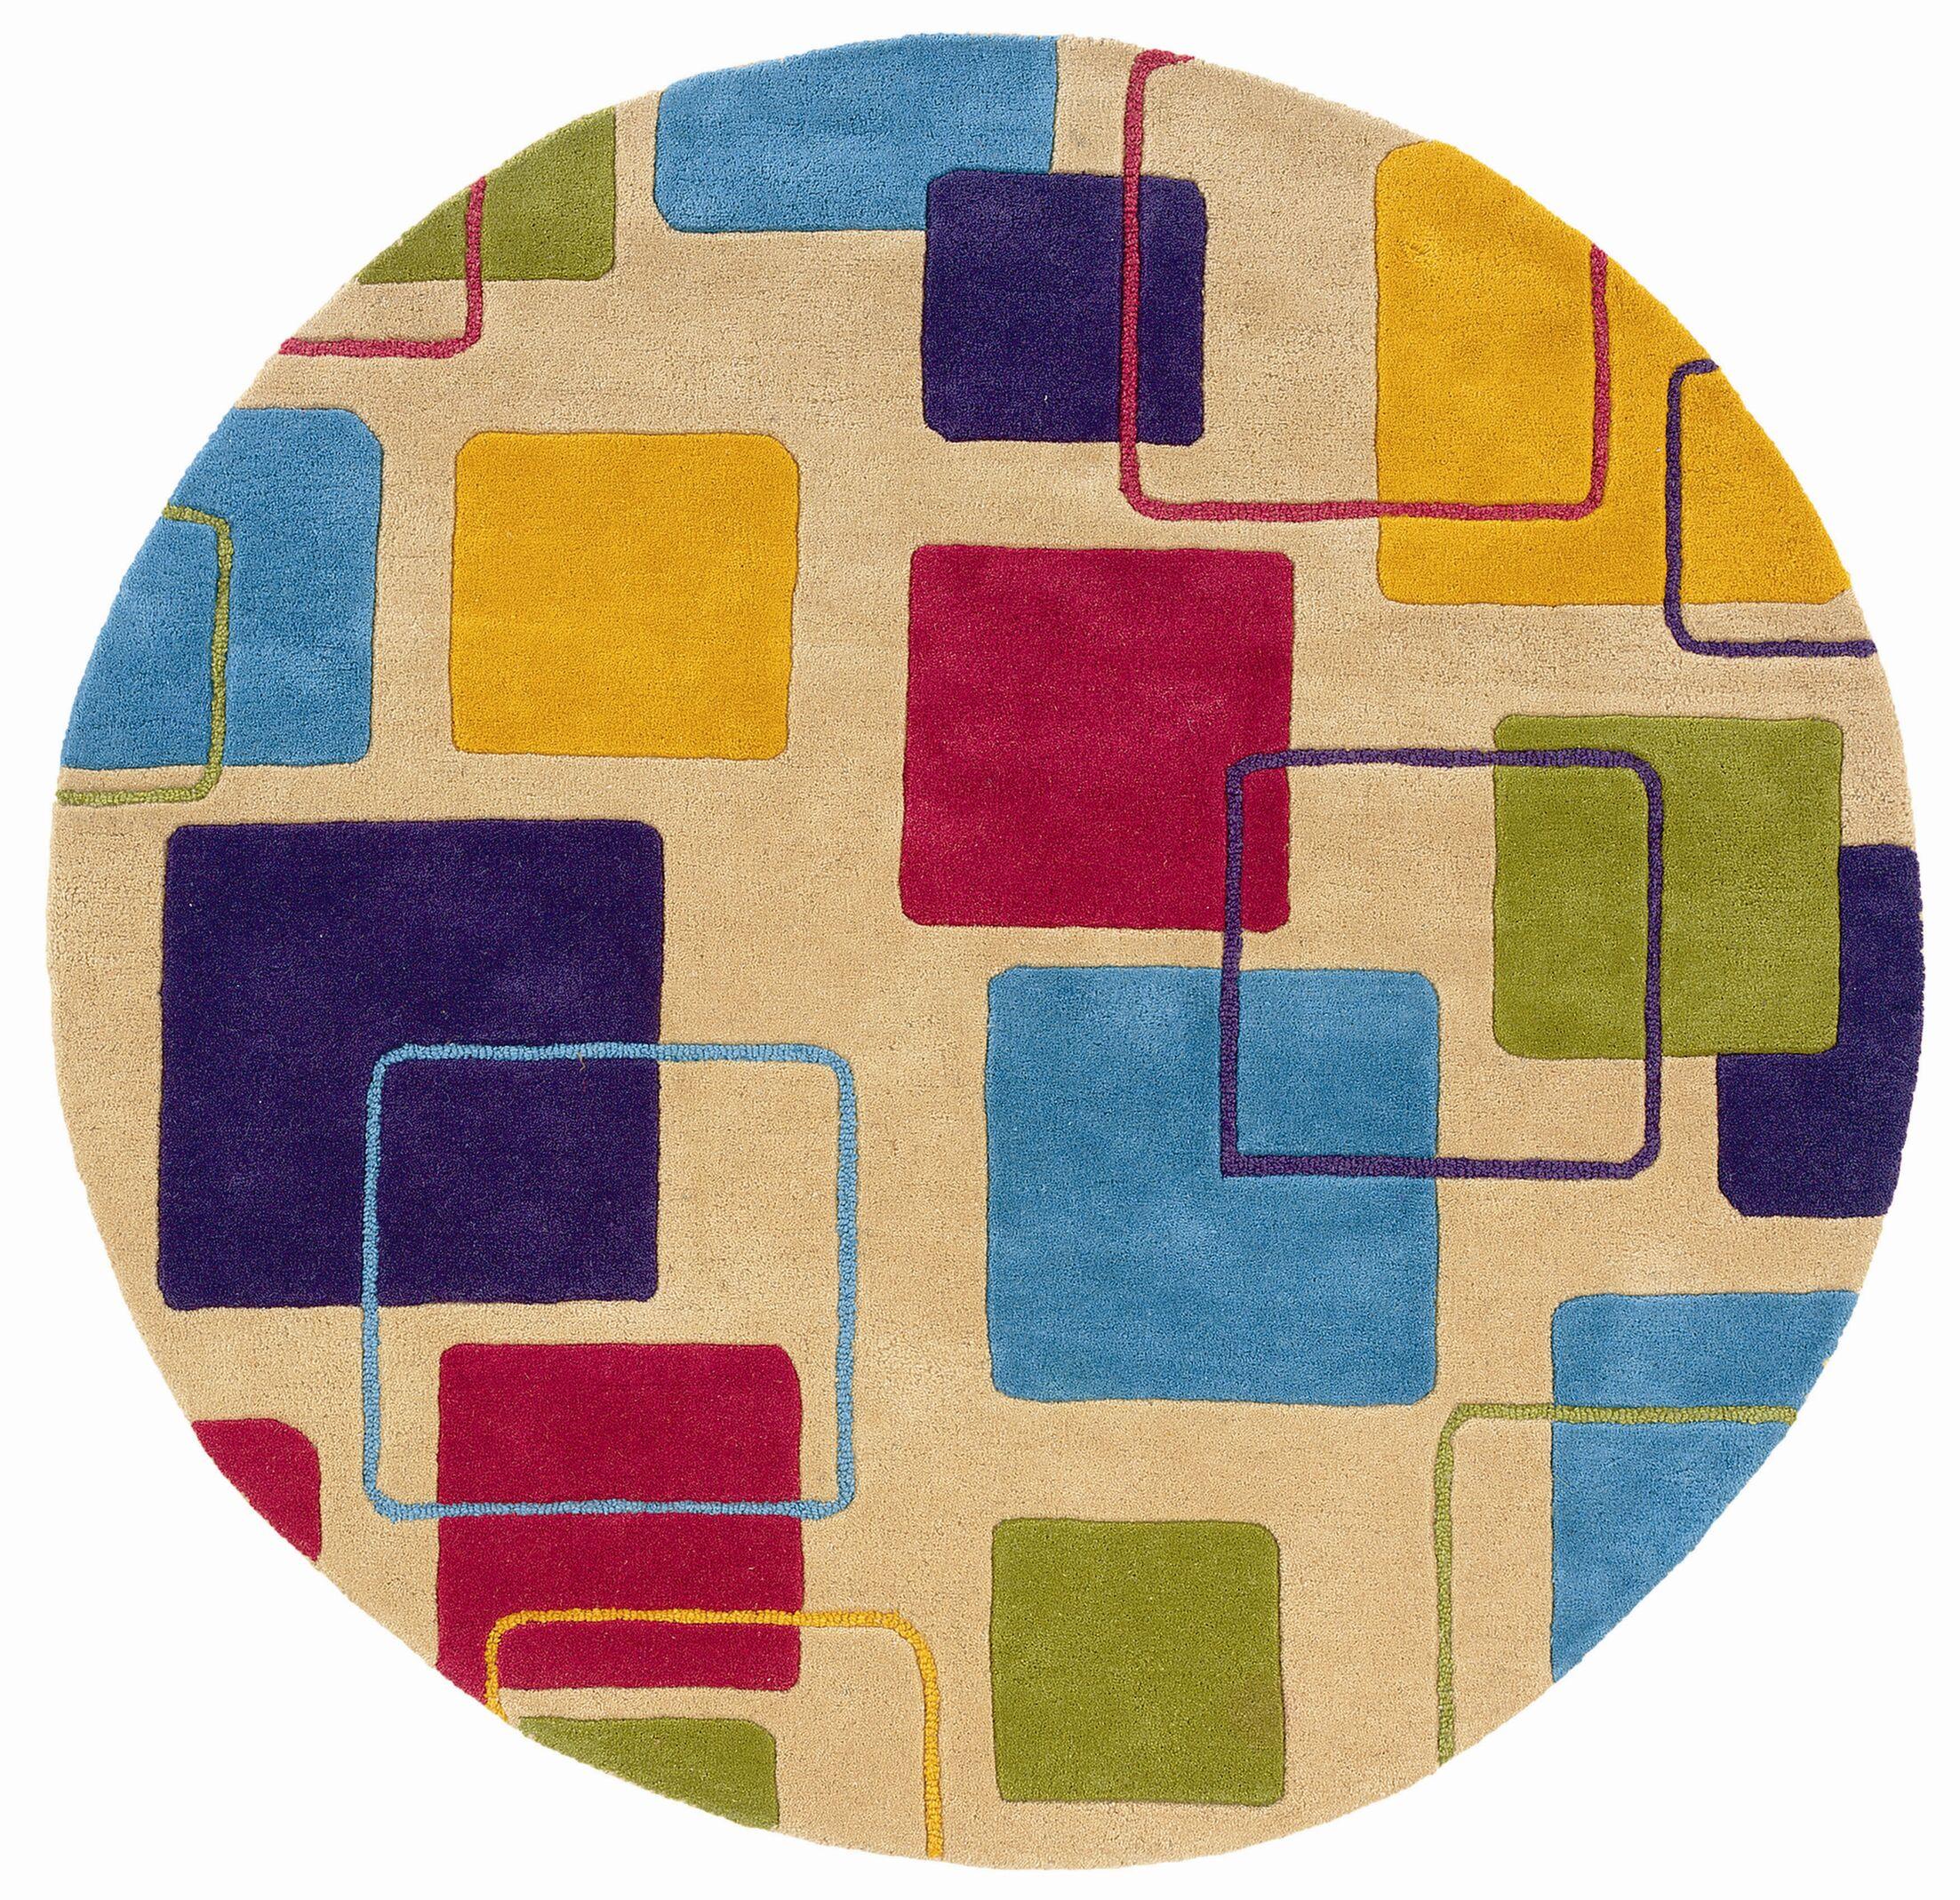 Leanne Ivory Geometric Squares Rug Rug Size: Round 7'9